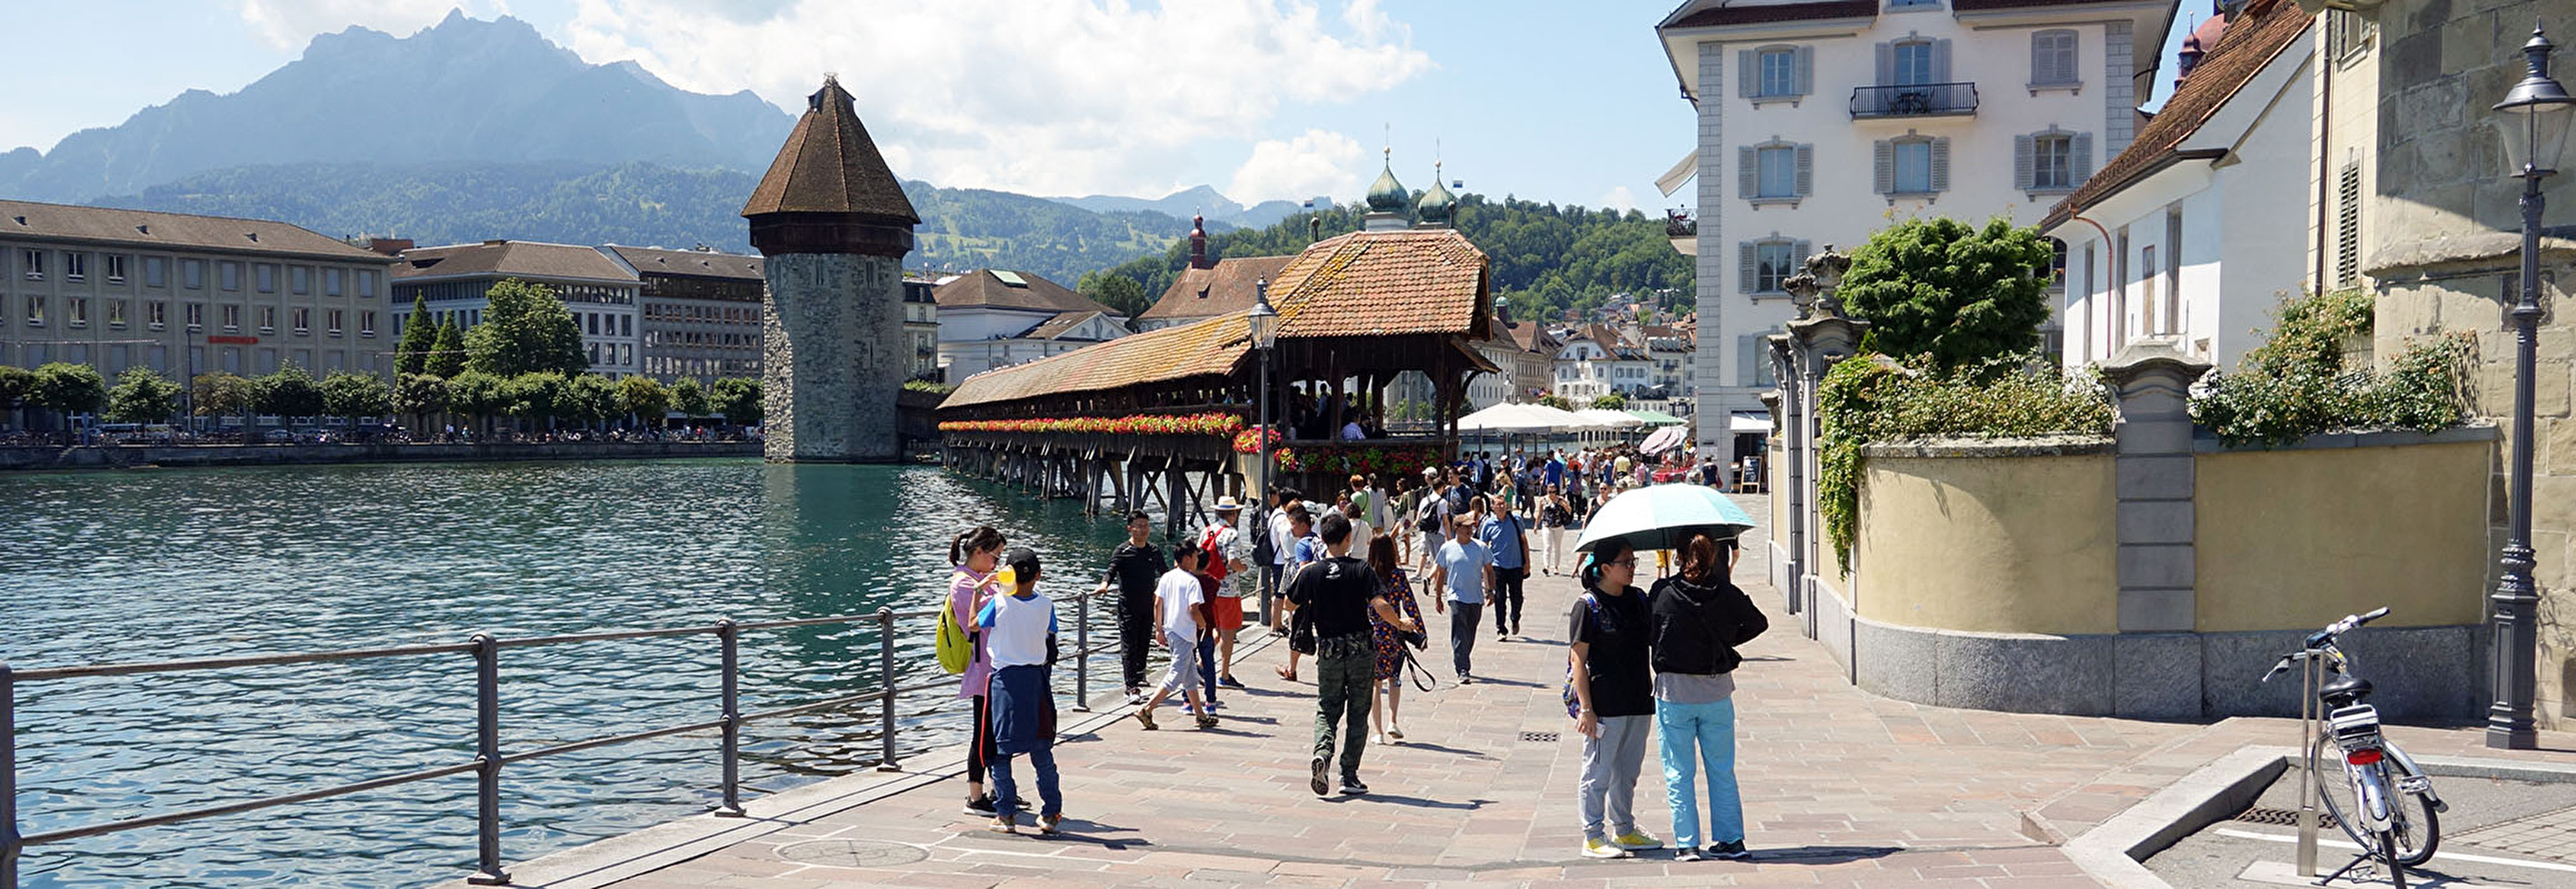 Strategieprozess Tourismus